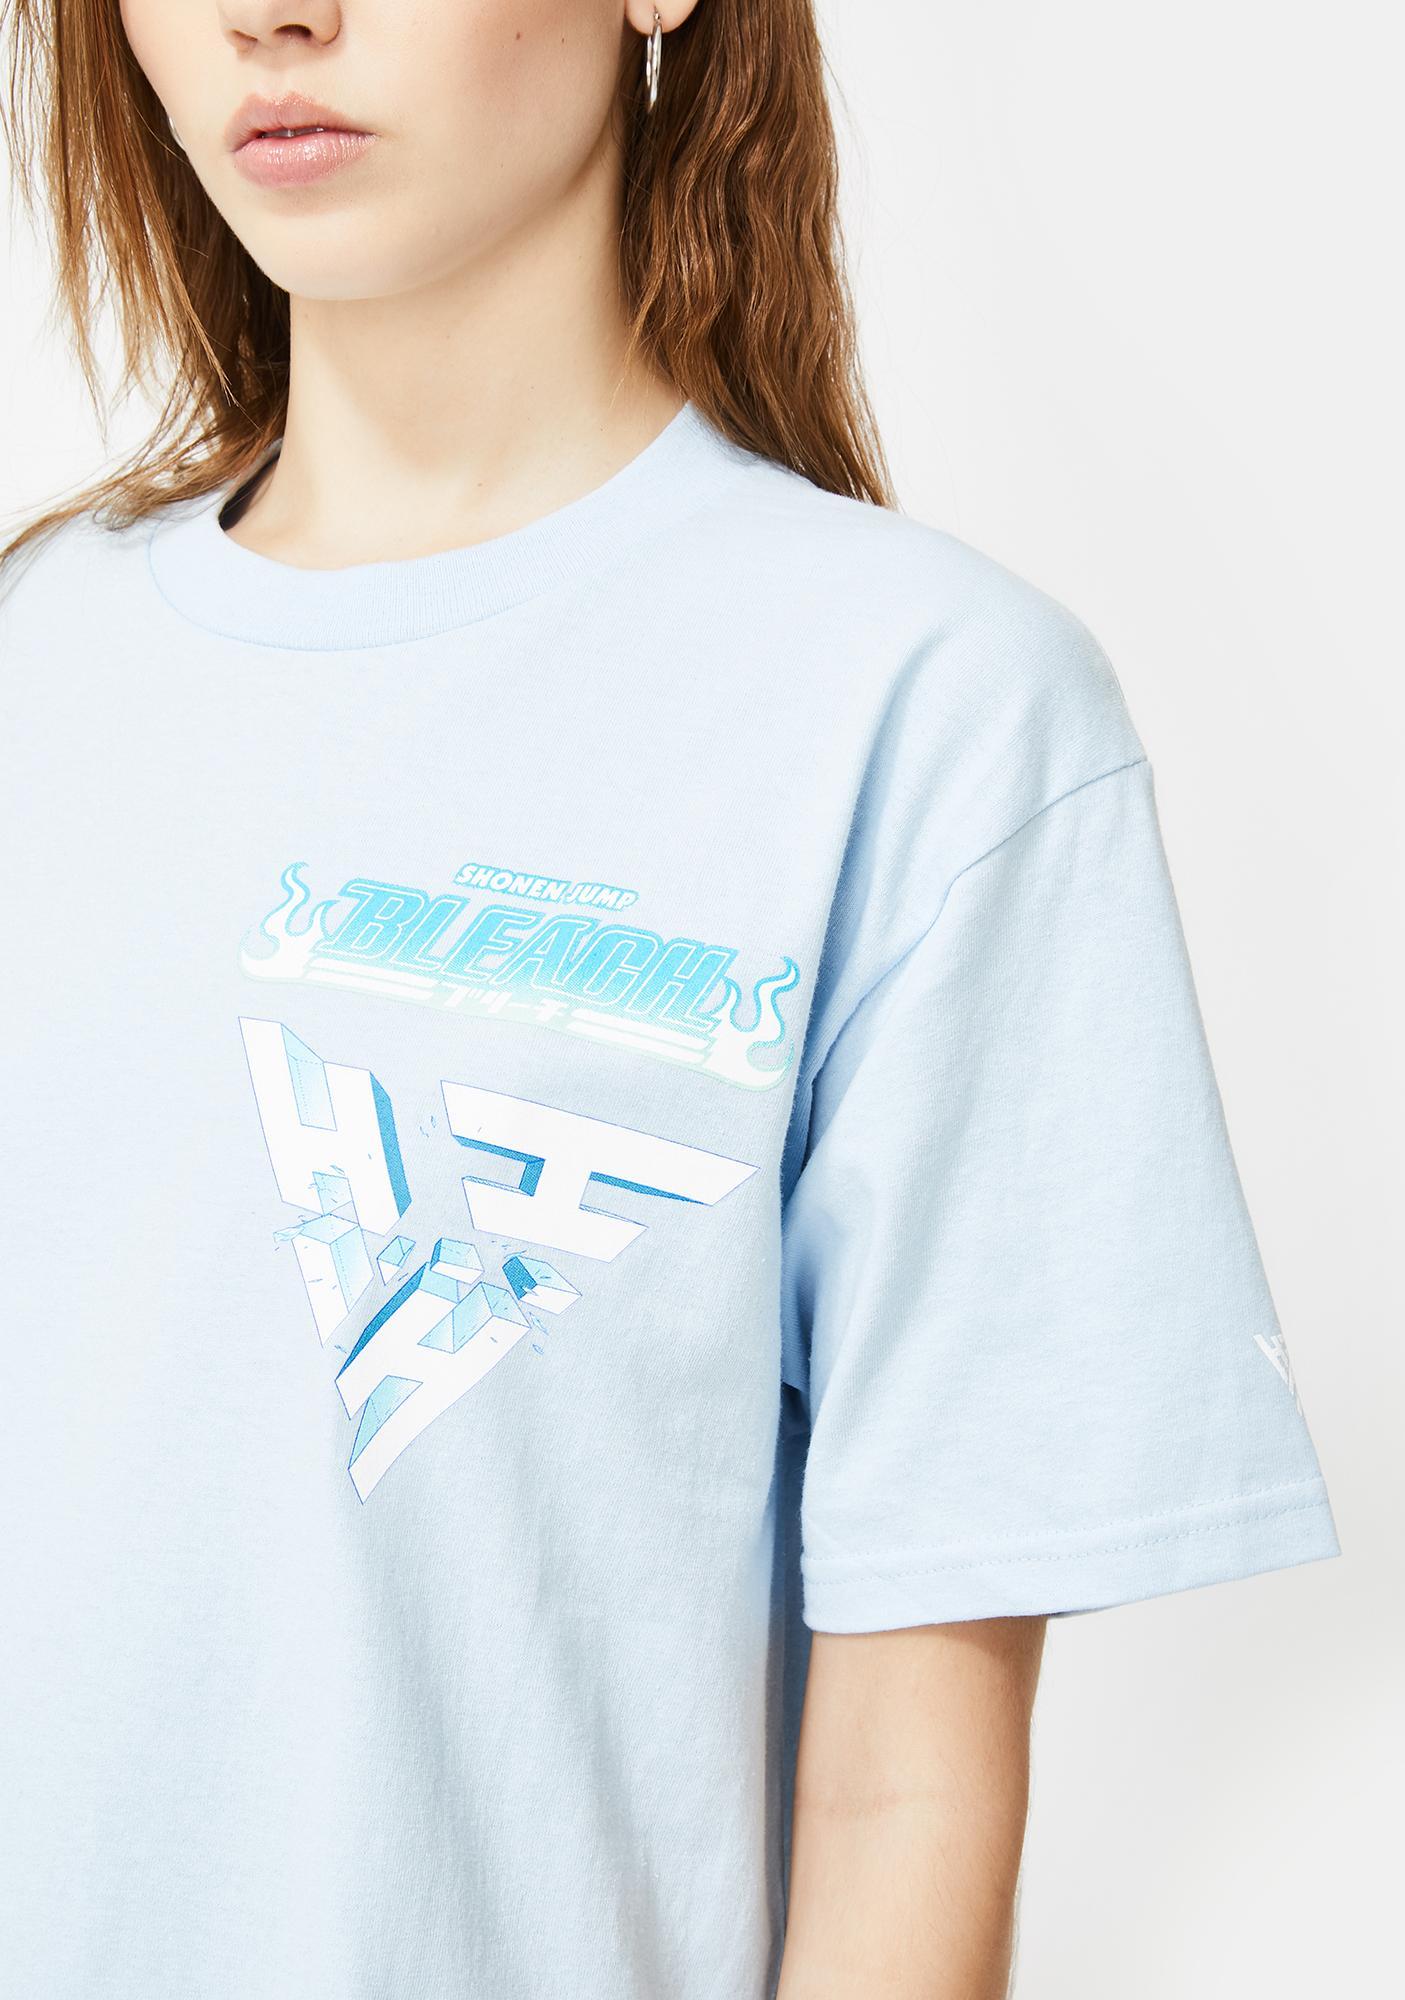 HYPLAND X Bleach Toshiro Breakthrough Graphic Tee